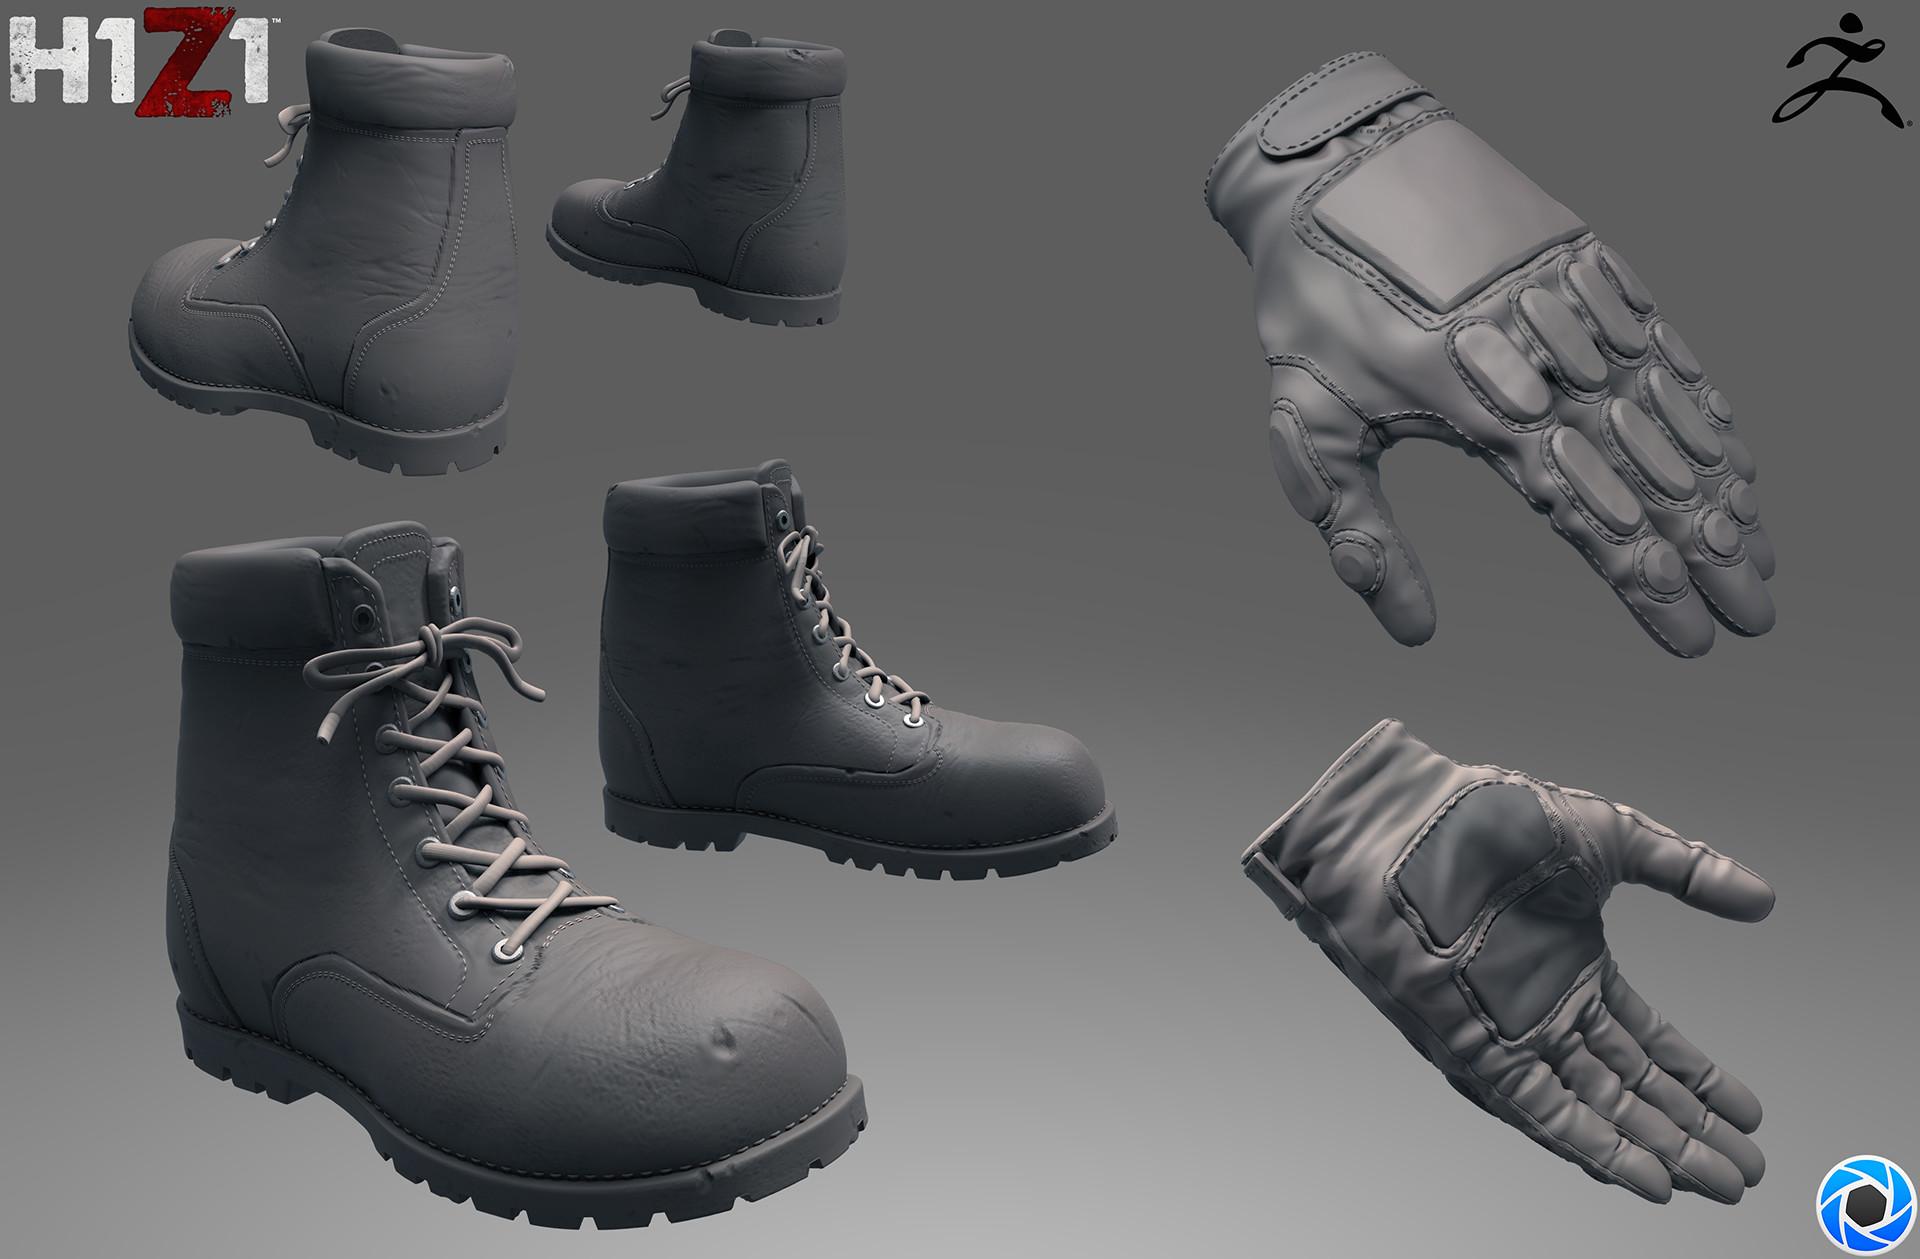 Satoshi arakawa boots and gloves sculpt